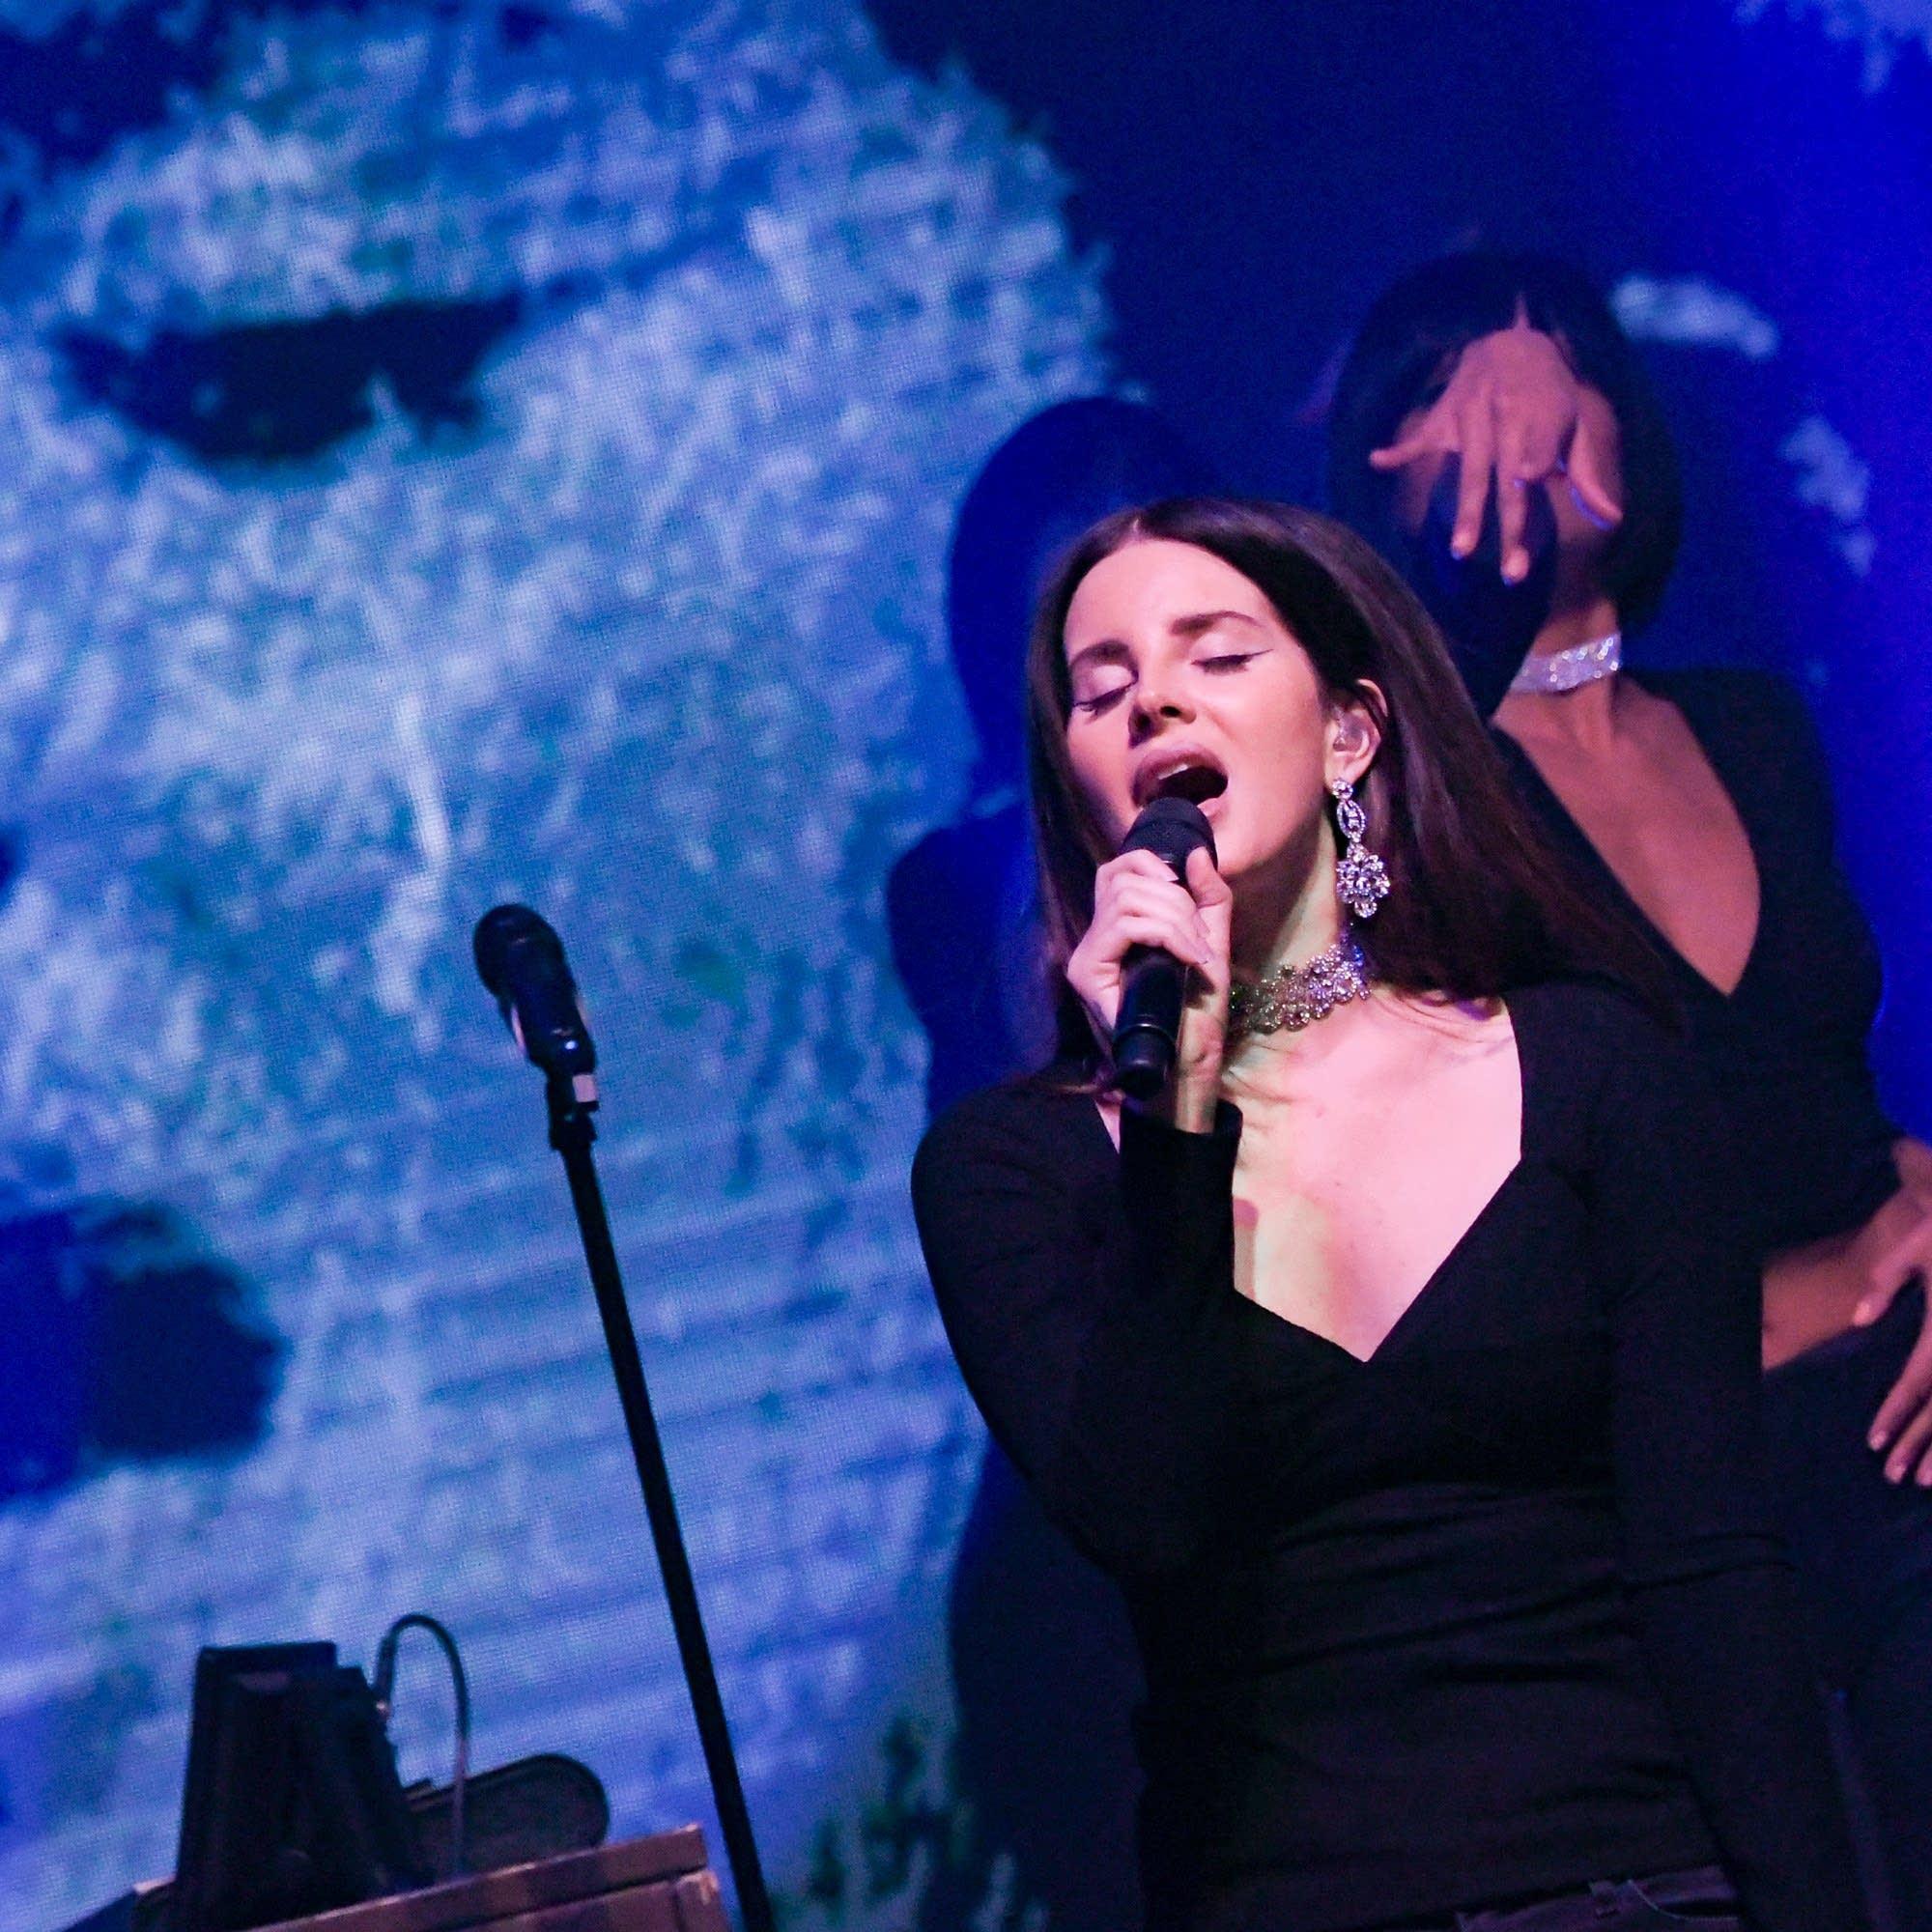 Lana Del Rey performs in New York City, October 2017.